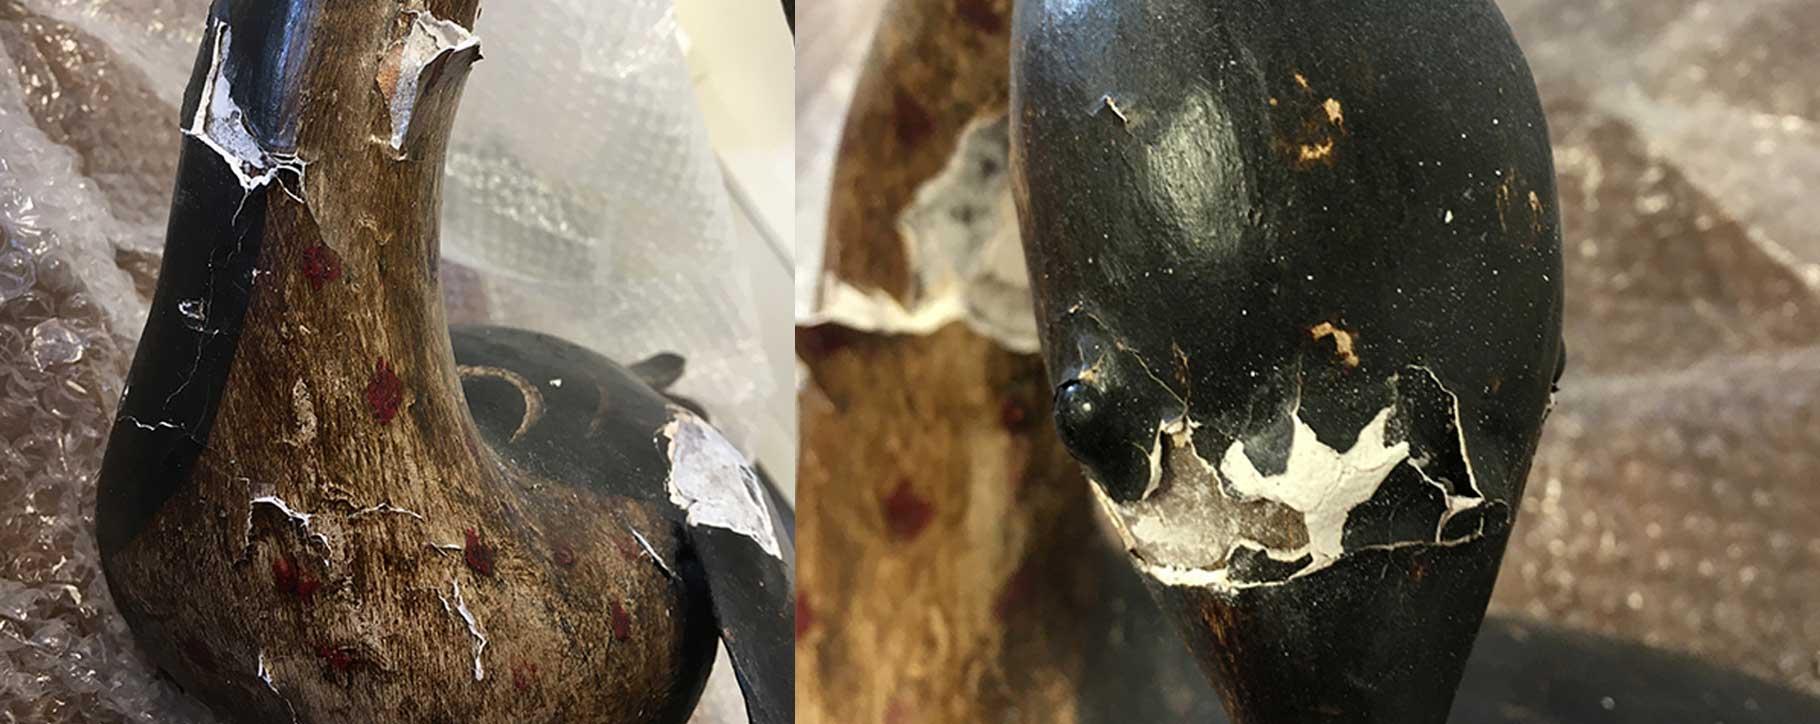 Close ups of damage to a ceramic bird